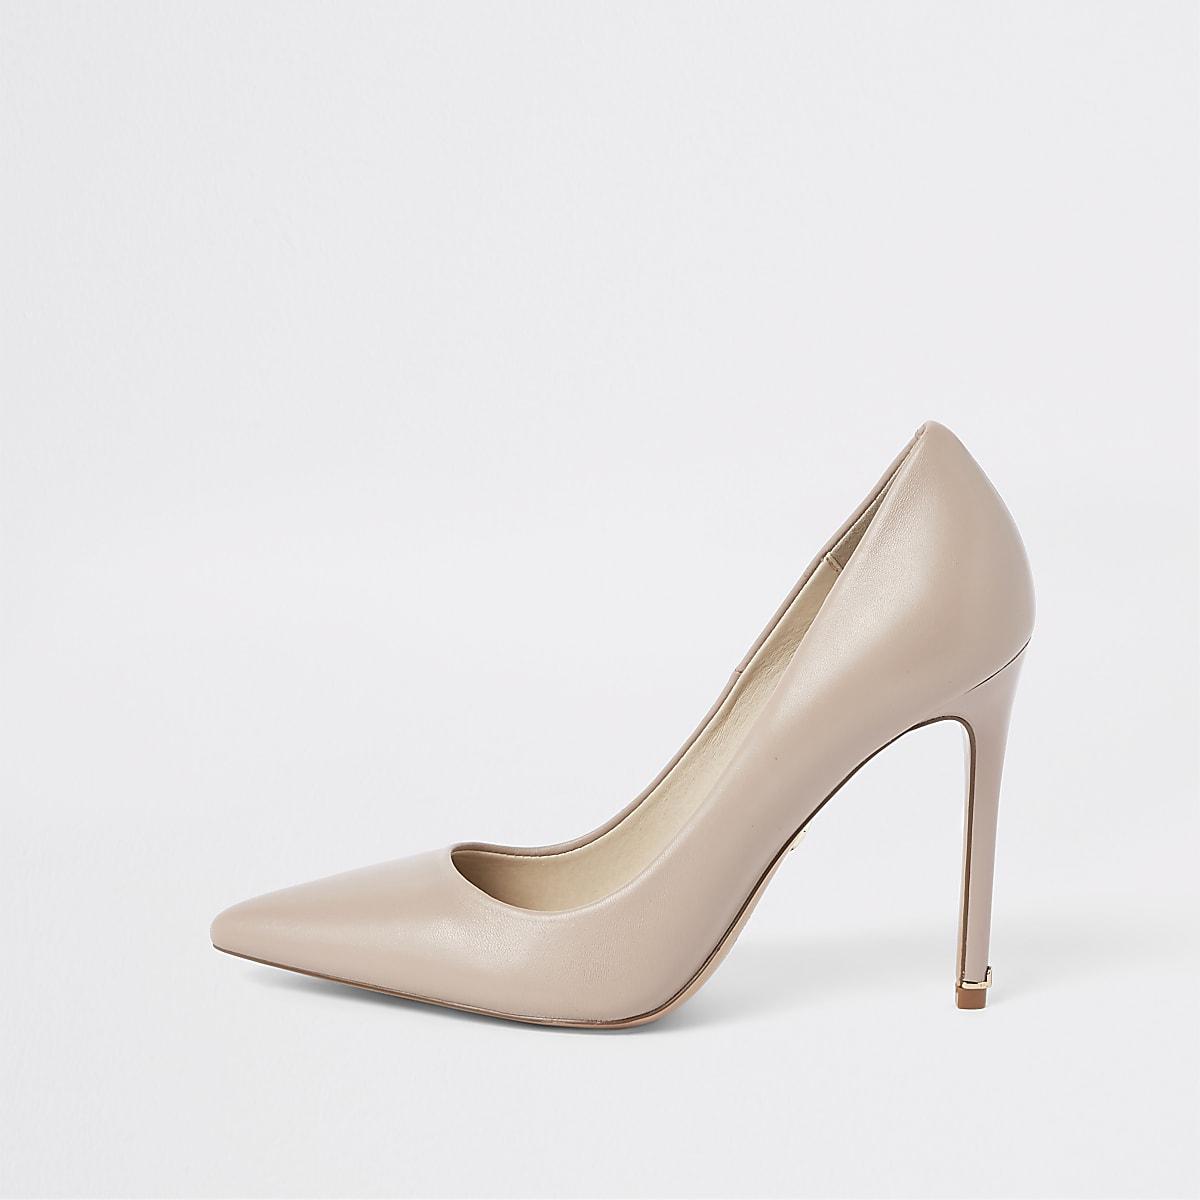 Light pink leather pumps